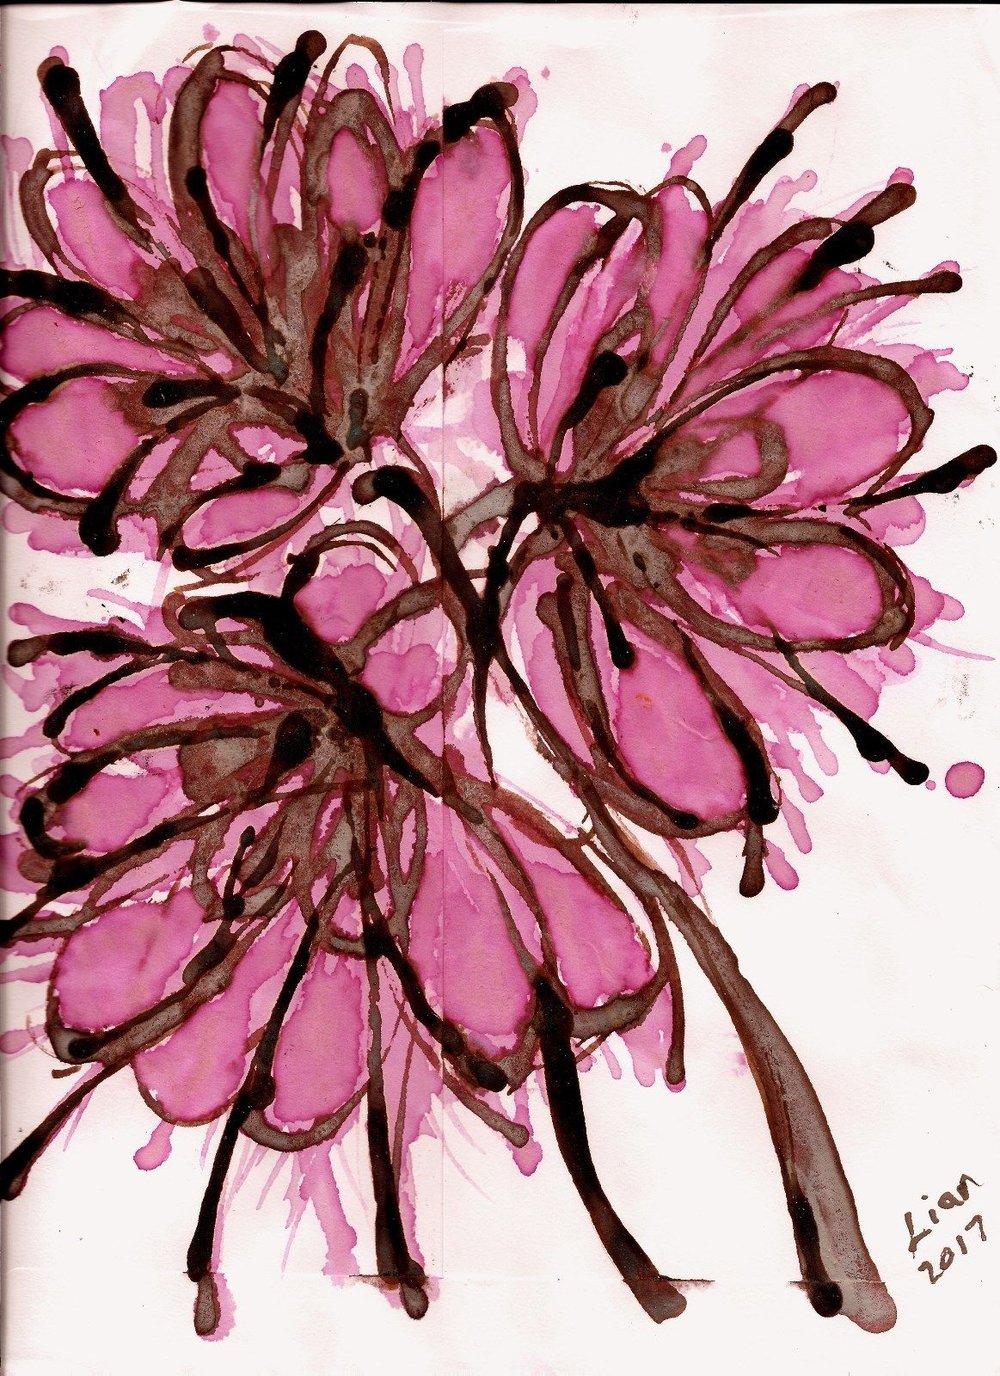 Lian Kool Aid art on manila envelope violets.jpg